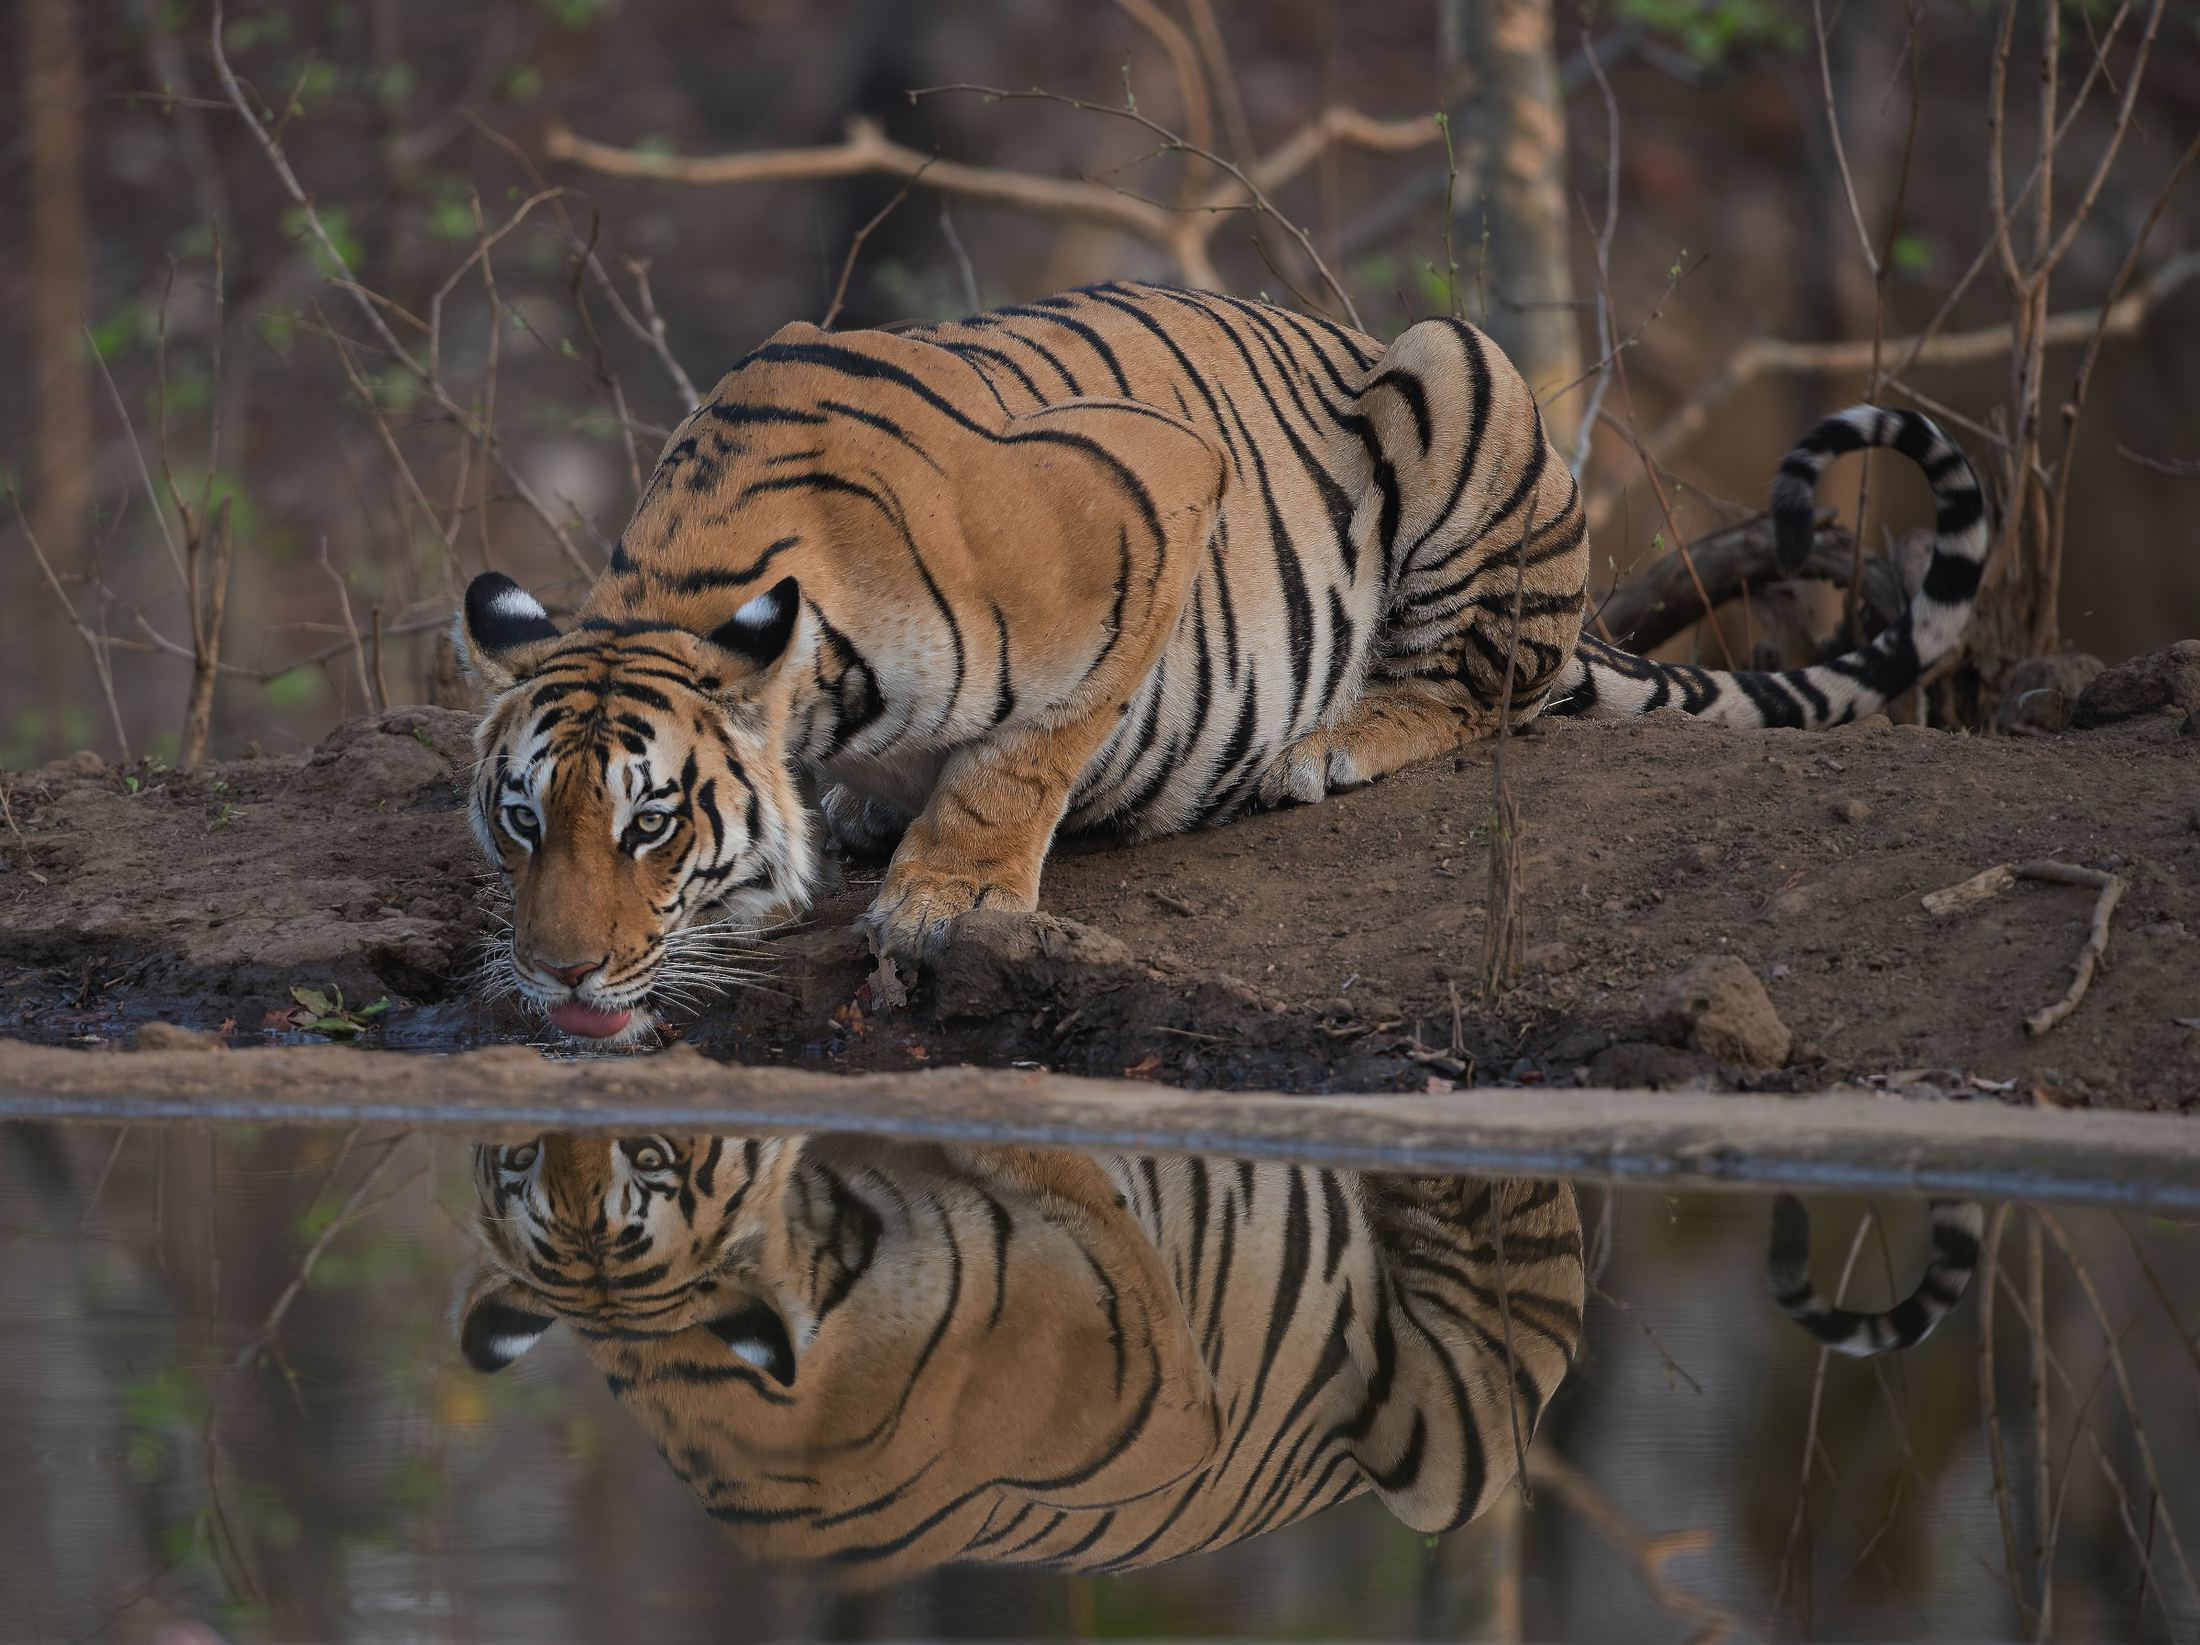 tiger lying on ground during daytime